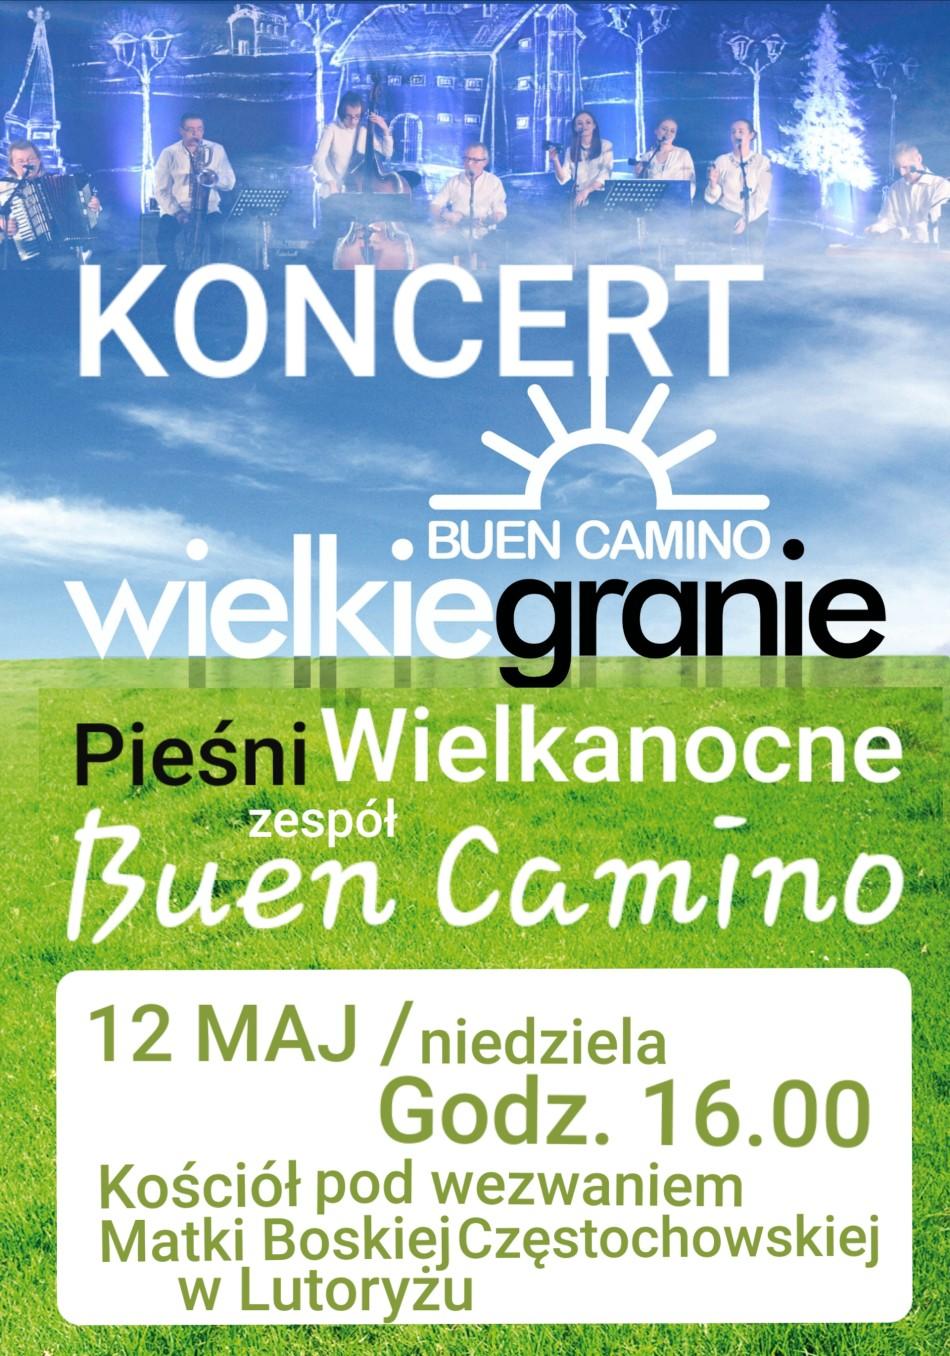 Plakat - Koncert Wielkanocny Buen Camino w Lutoryżu.